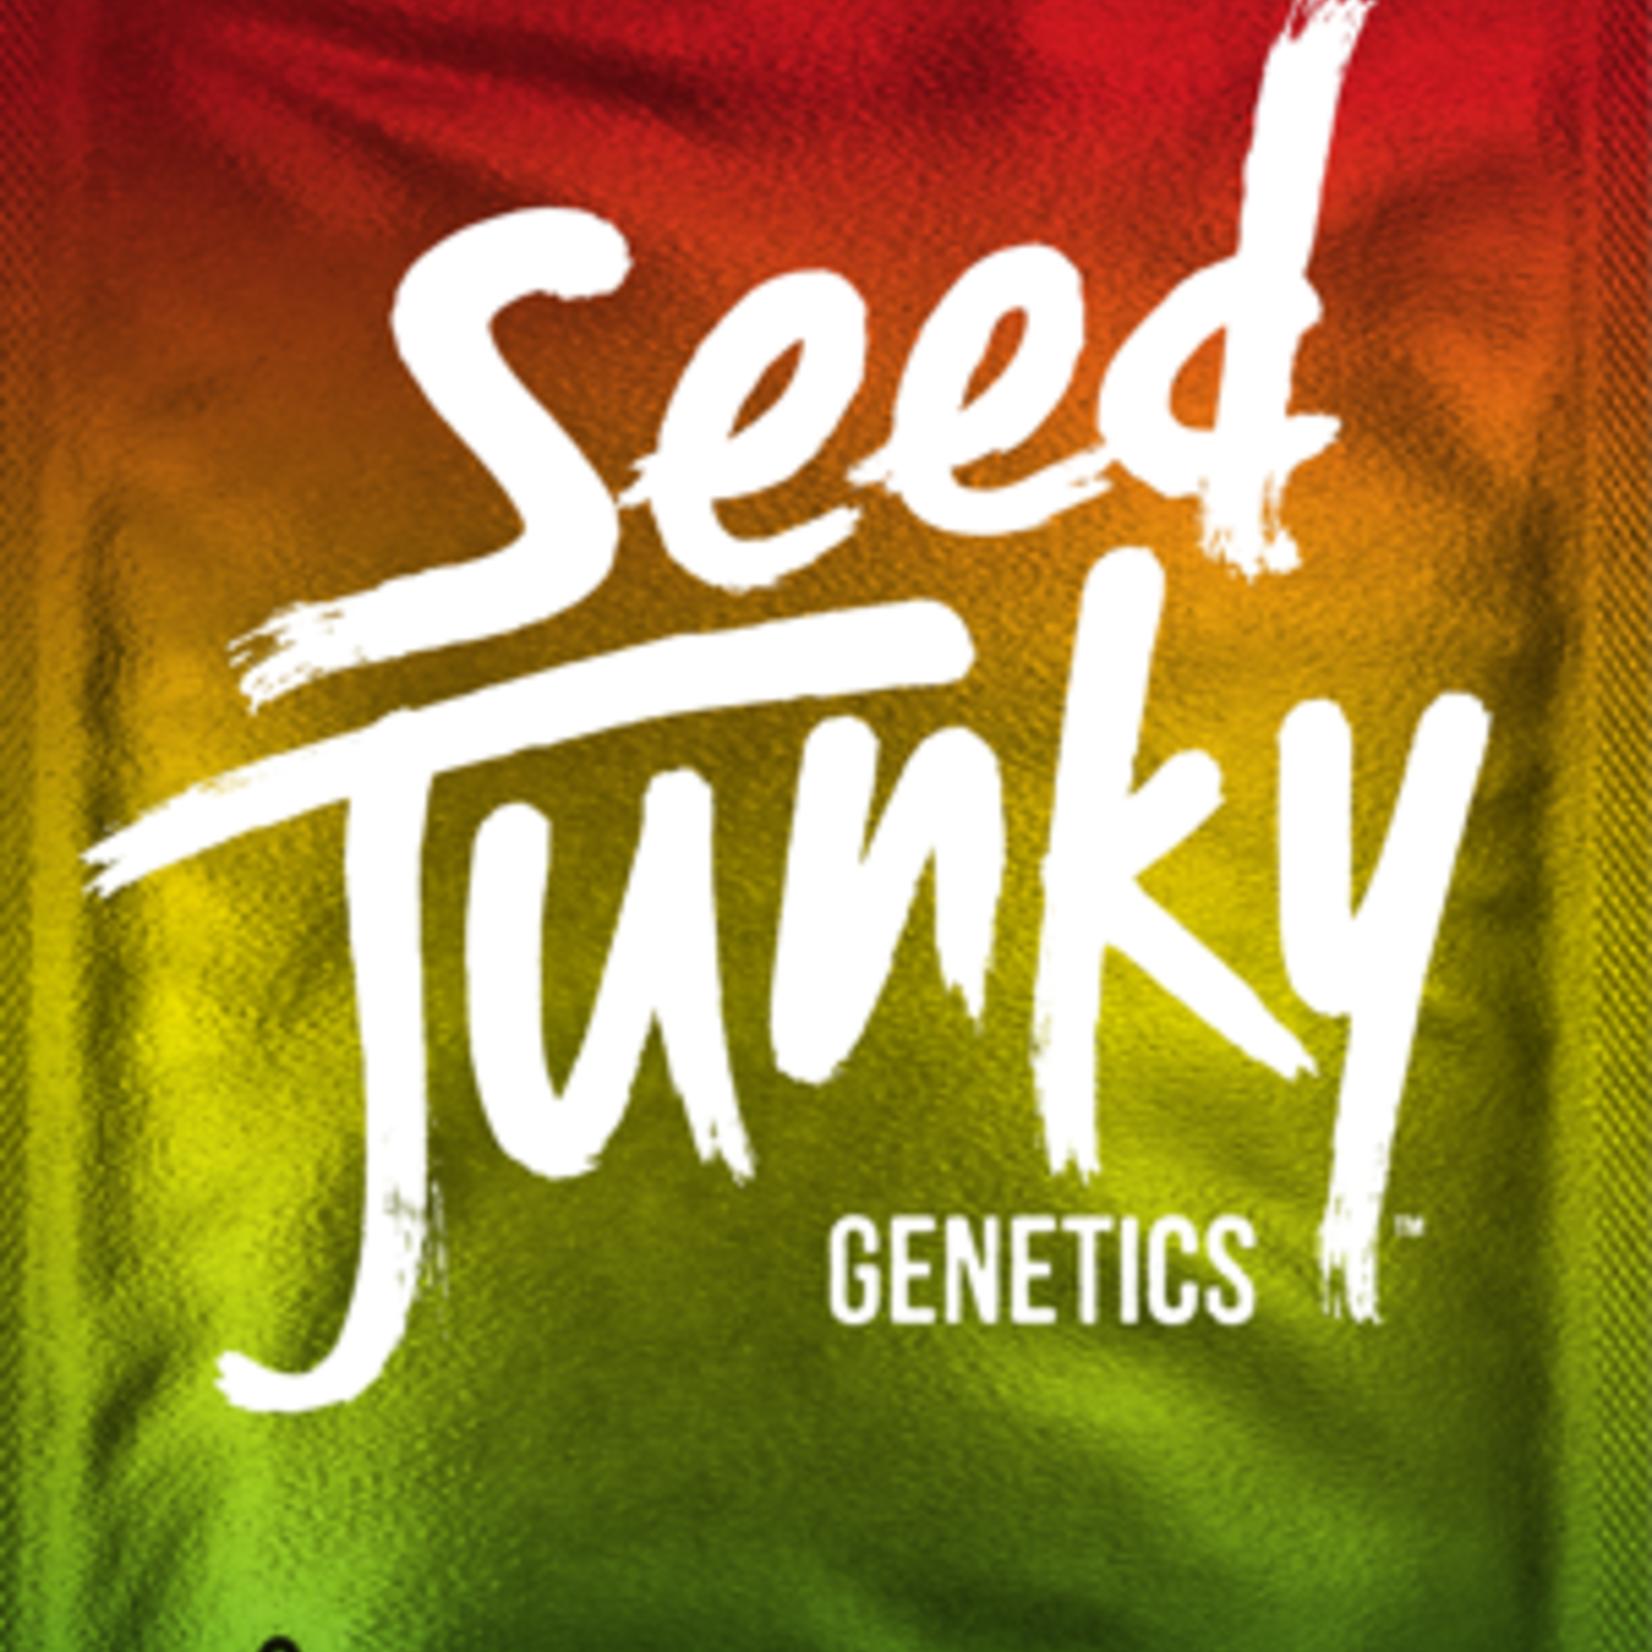 seed junky Seed Junky - Purple Push Pop - 1/8th